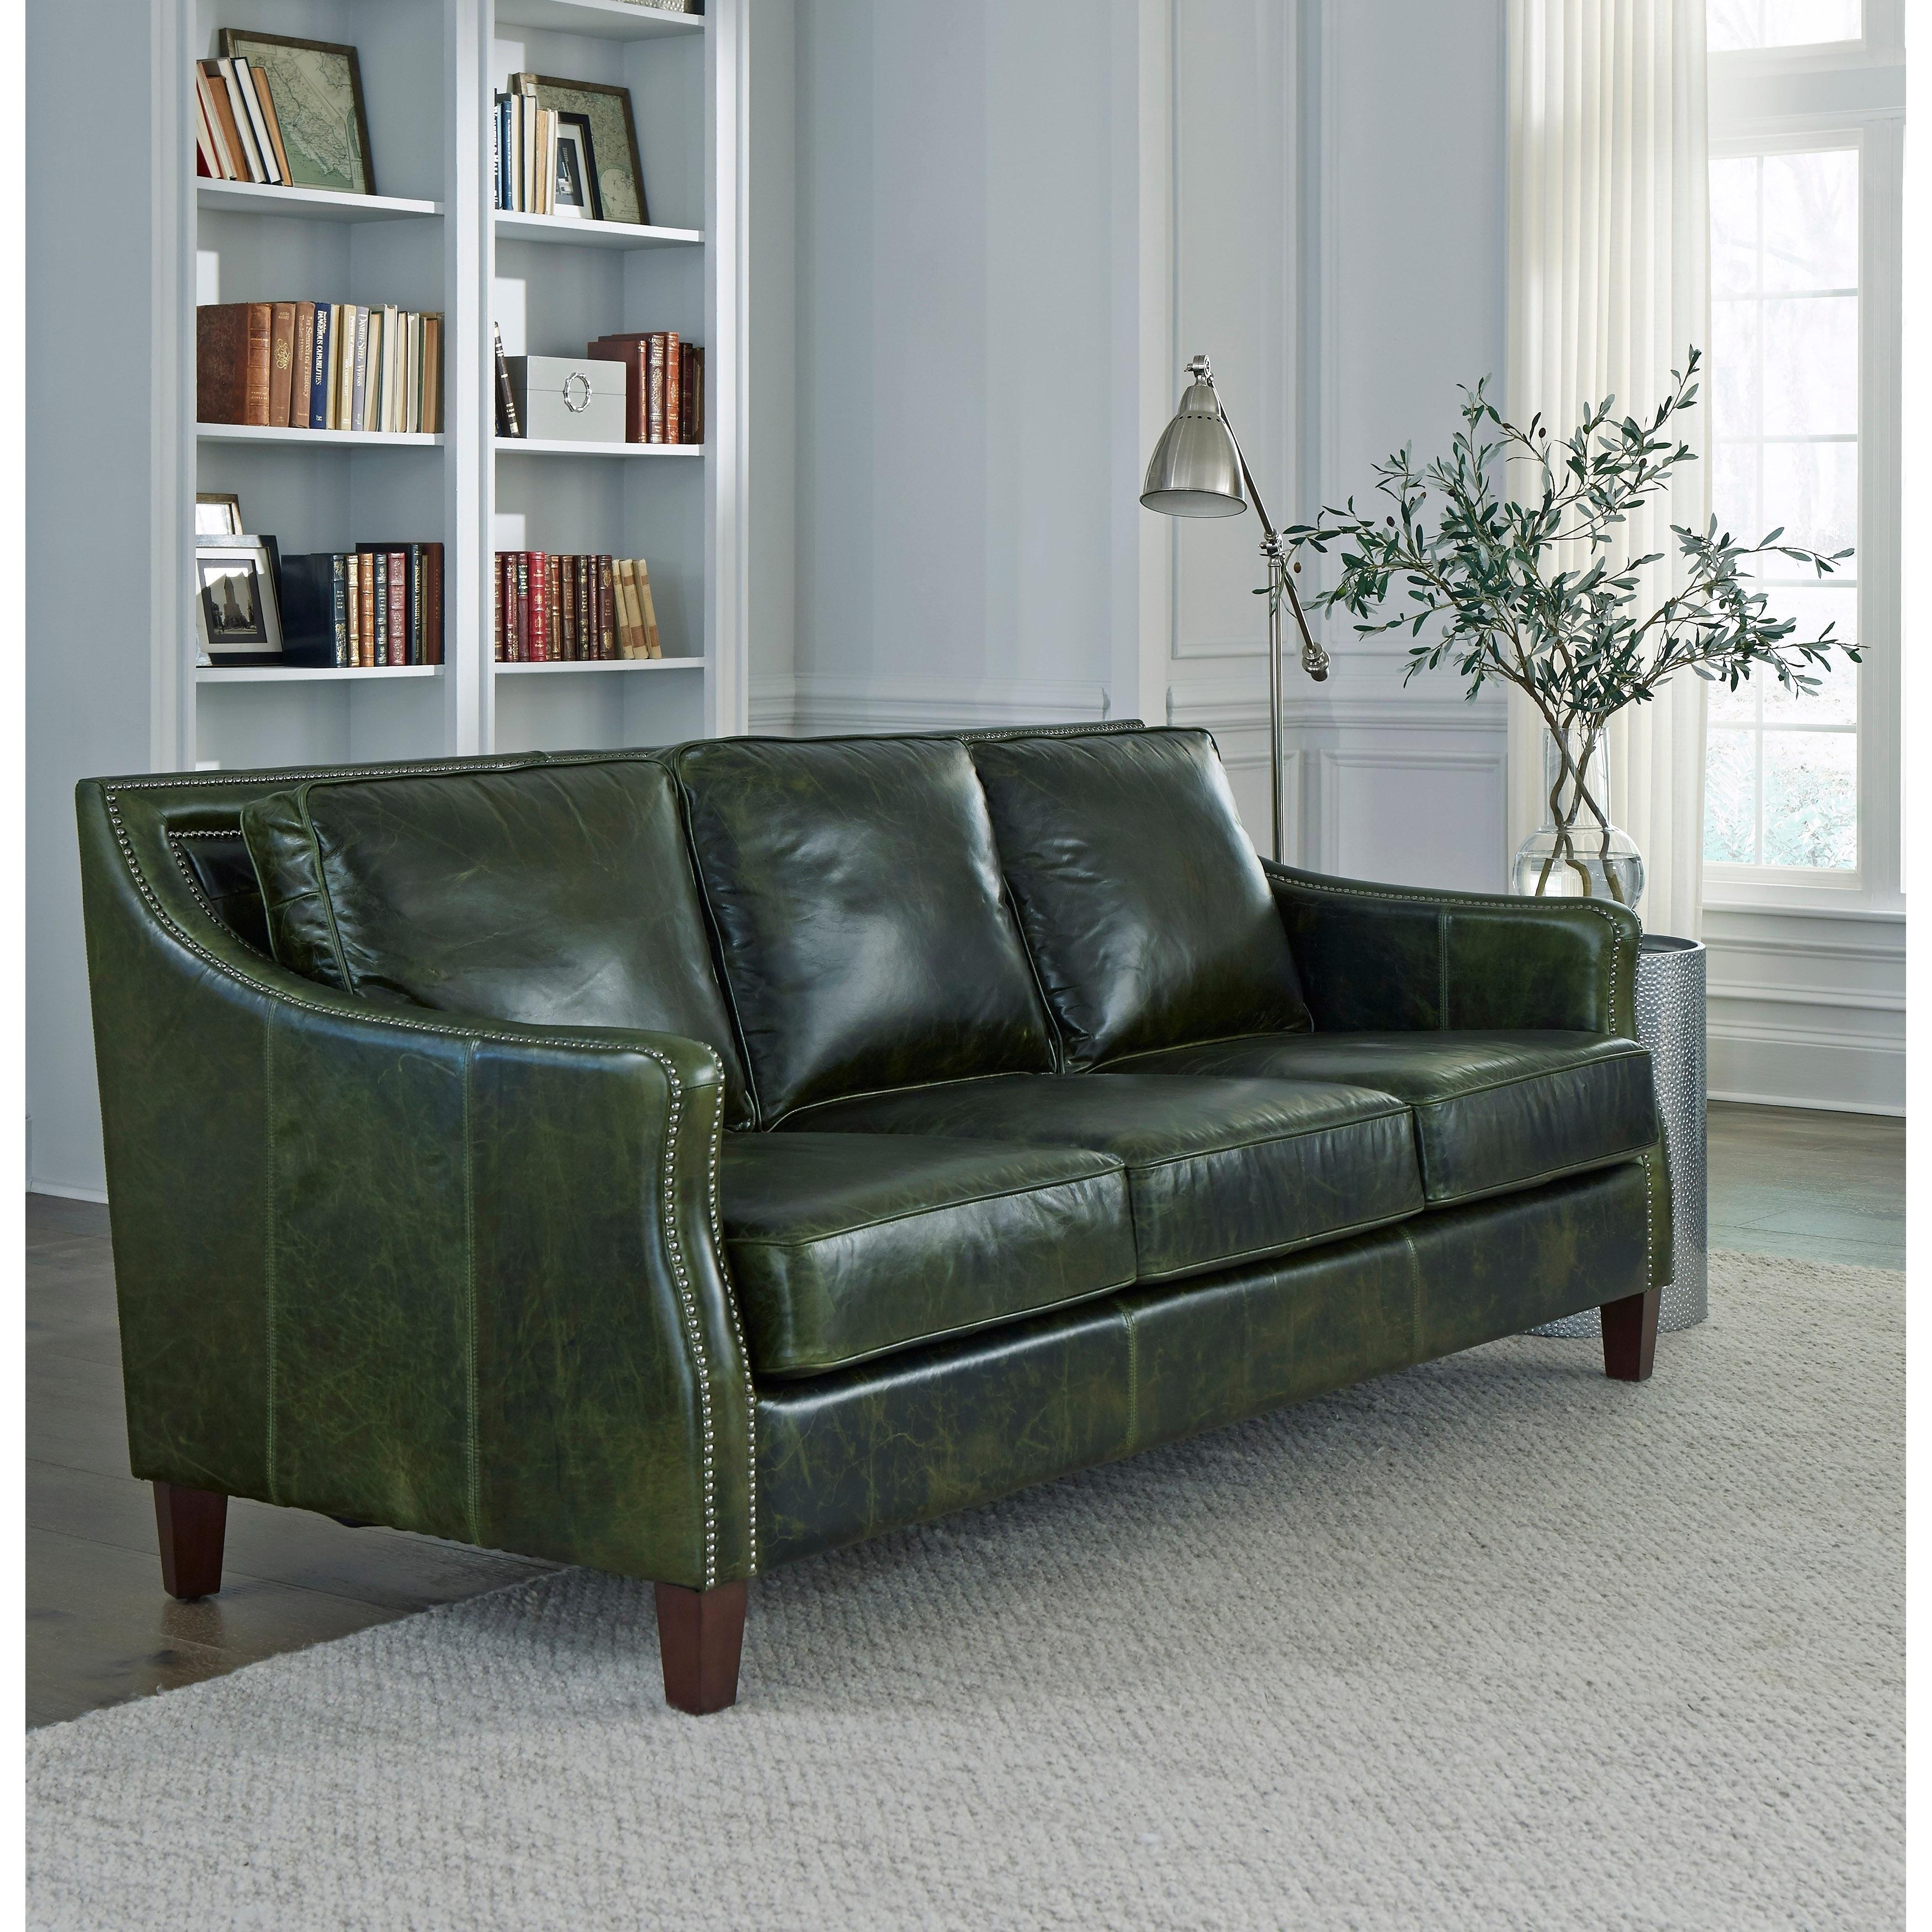 Green Top Grain Leather Sofa